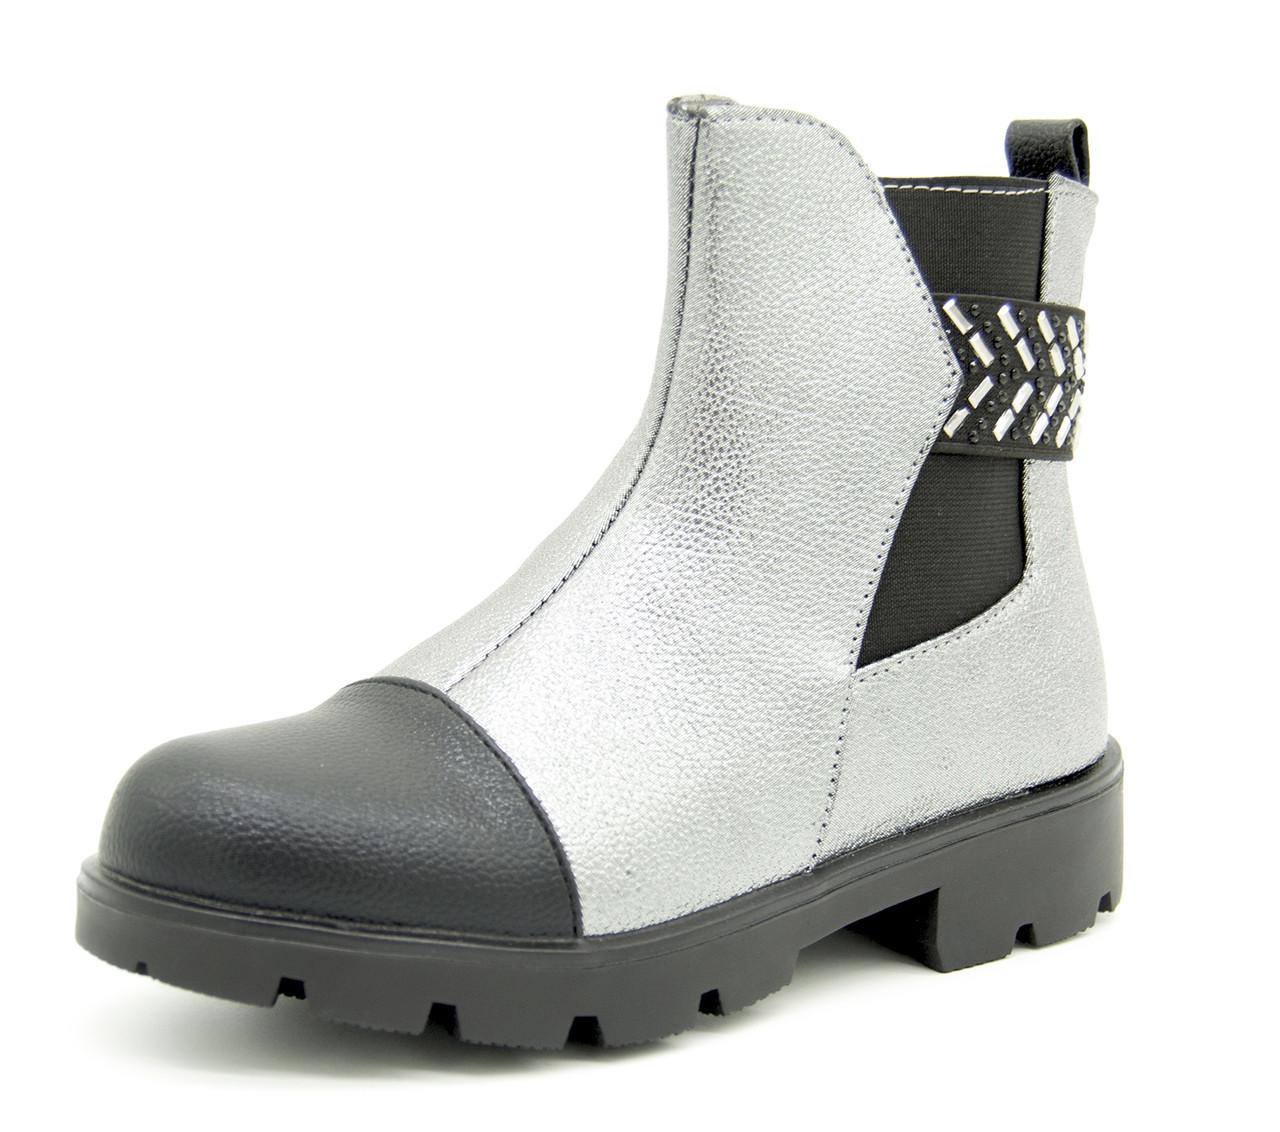 Демисезонные ботинки Kimbo FG98-3C silver 35 (22 см) (RO1225560)